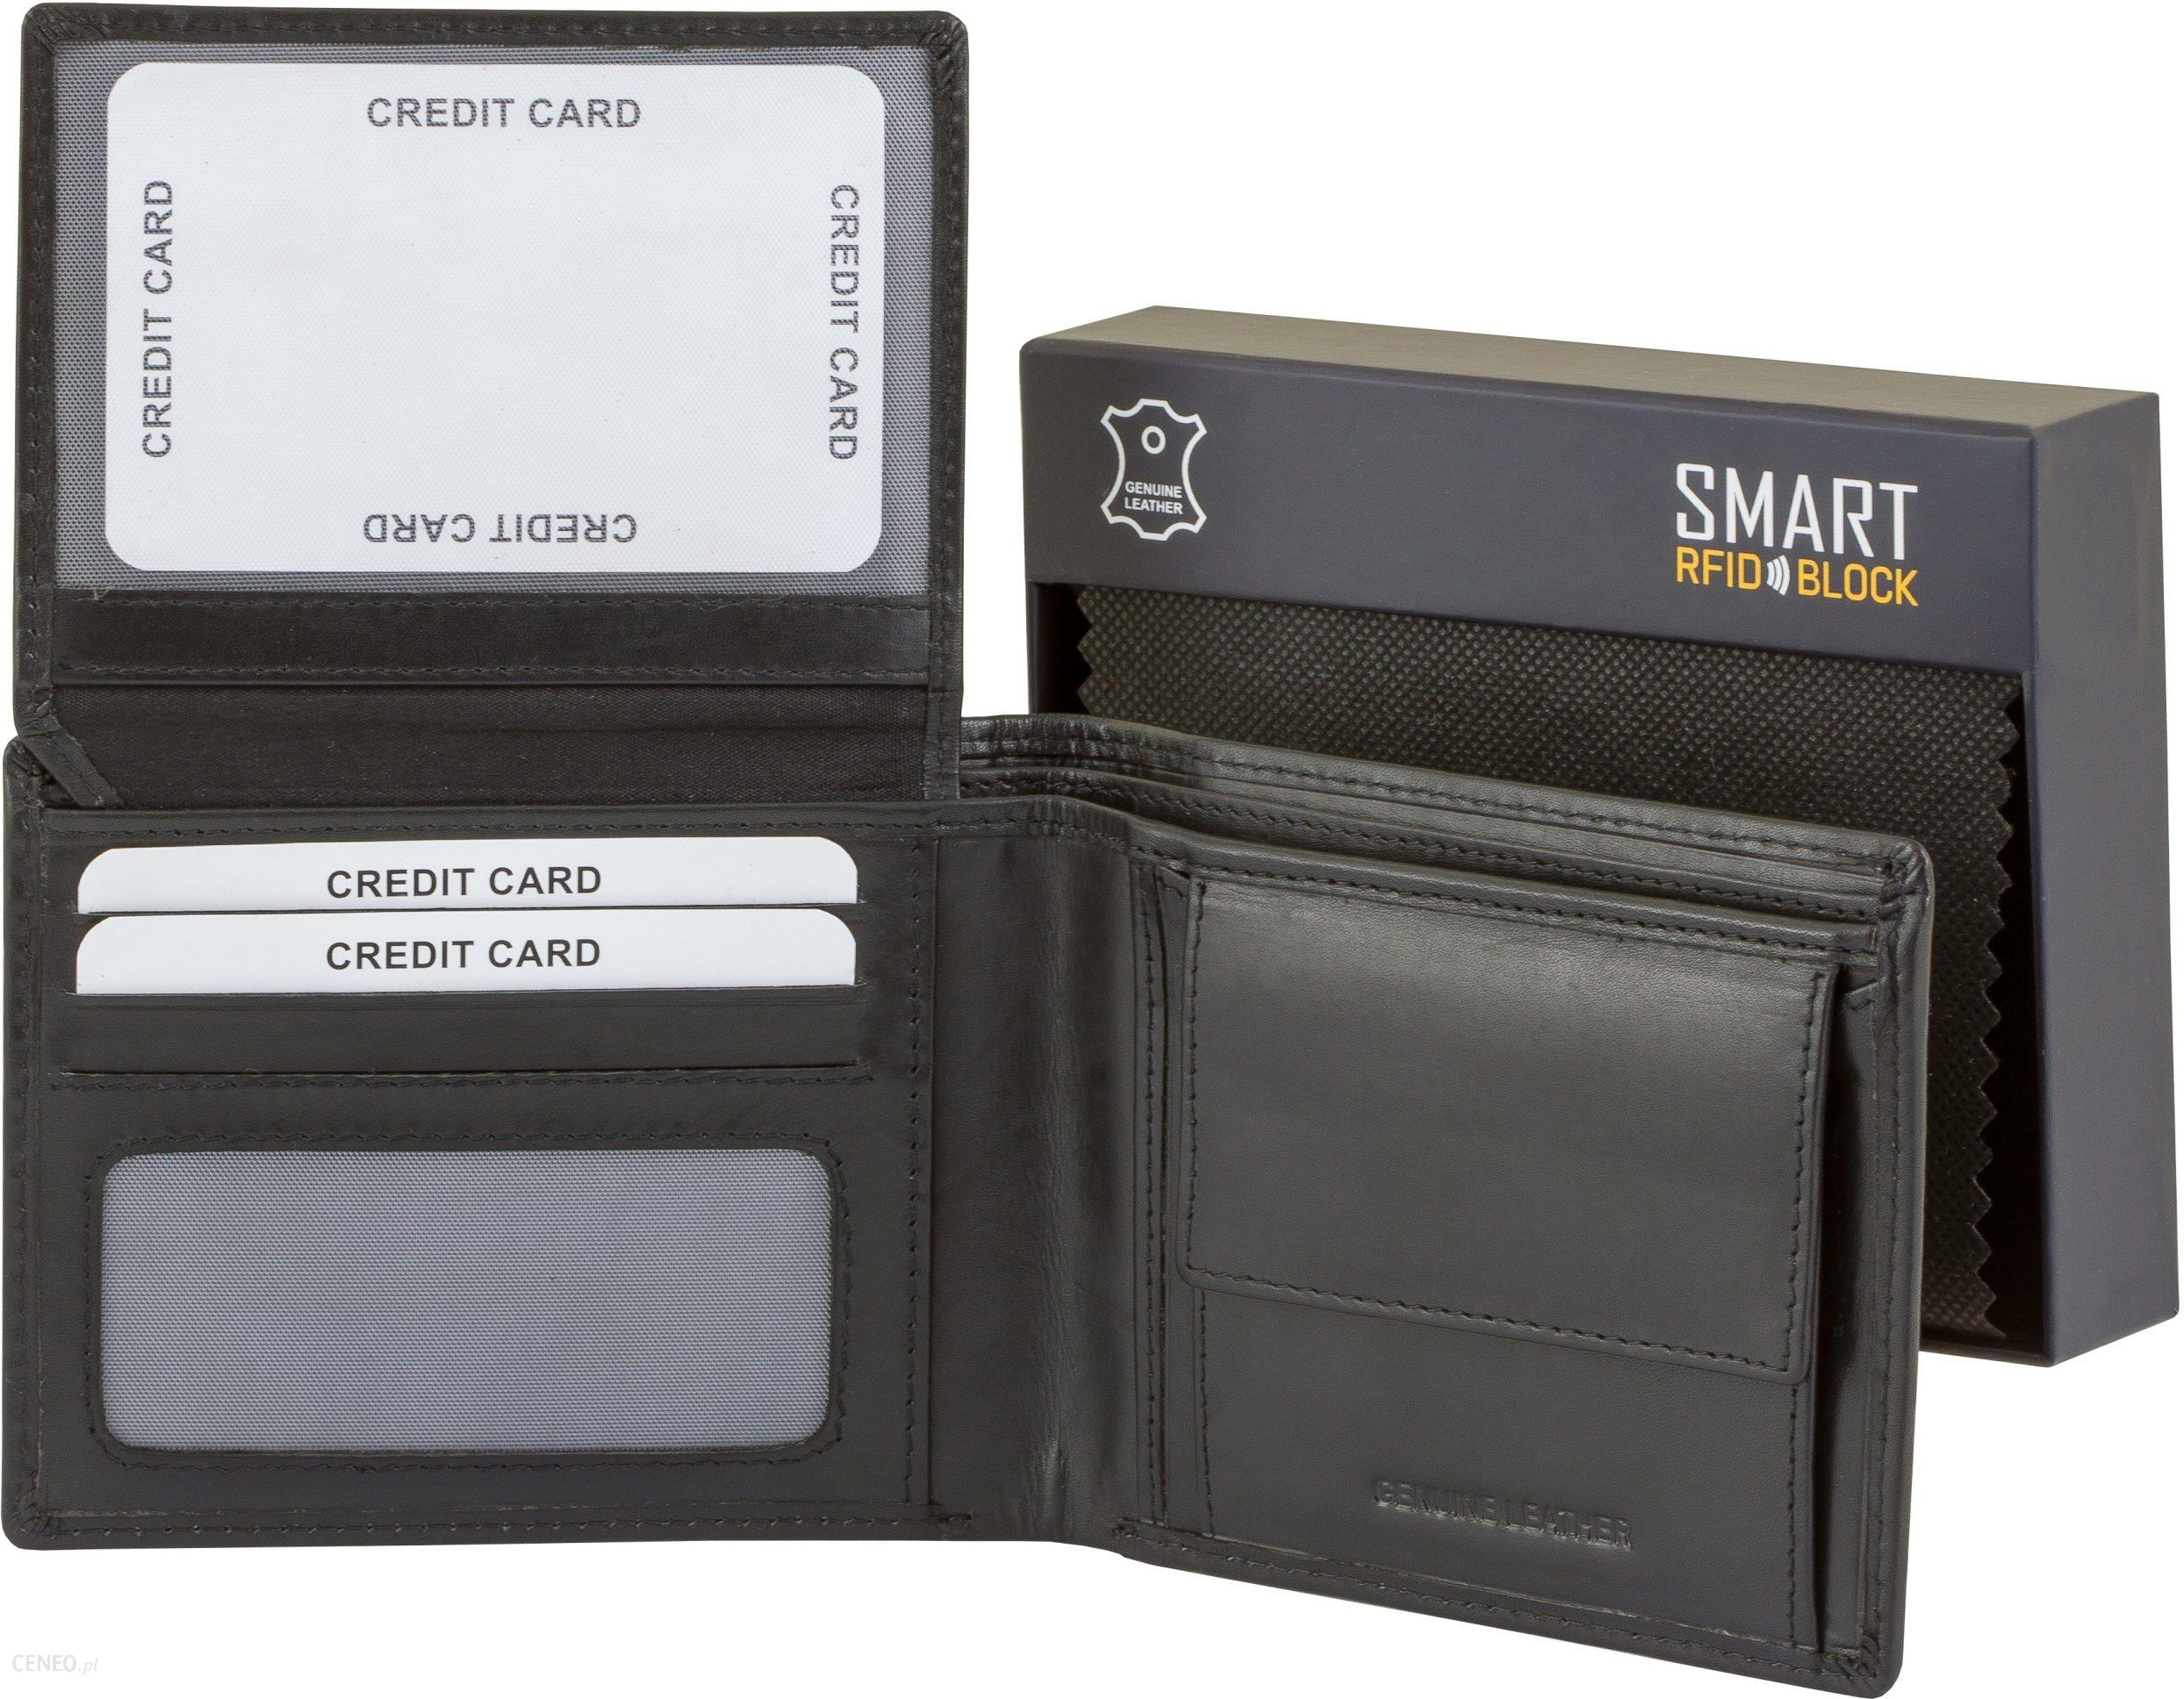 2da4a10c82590 Slim Męski Portfel Ochrona Kart PayPass Rfid - Ceny i opinie - Ceneo.pl